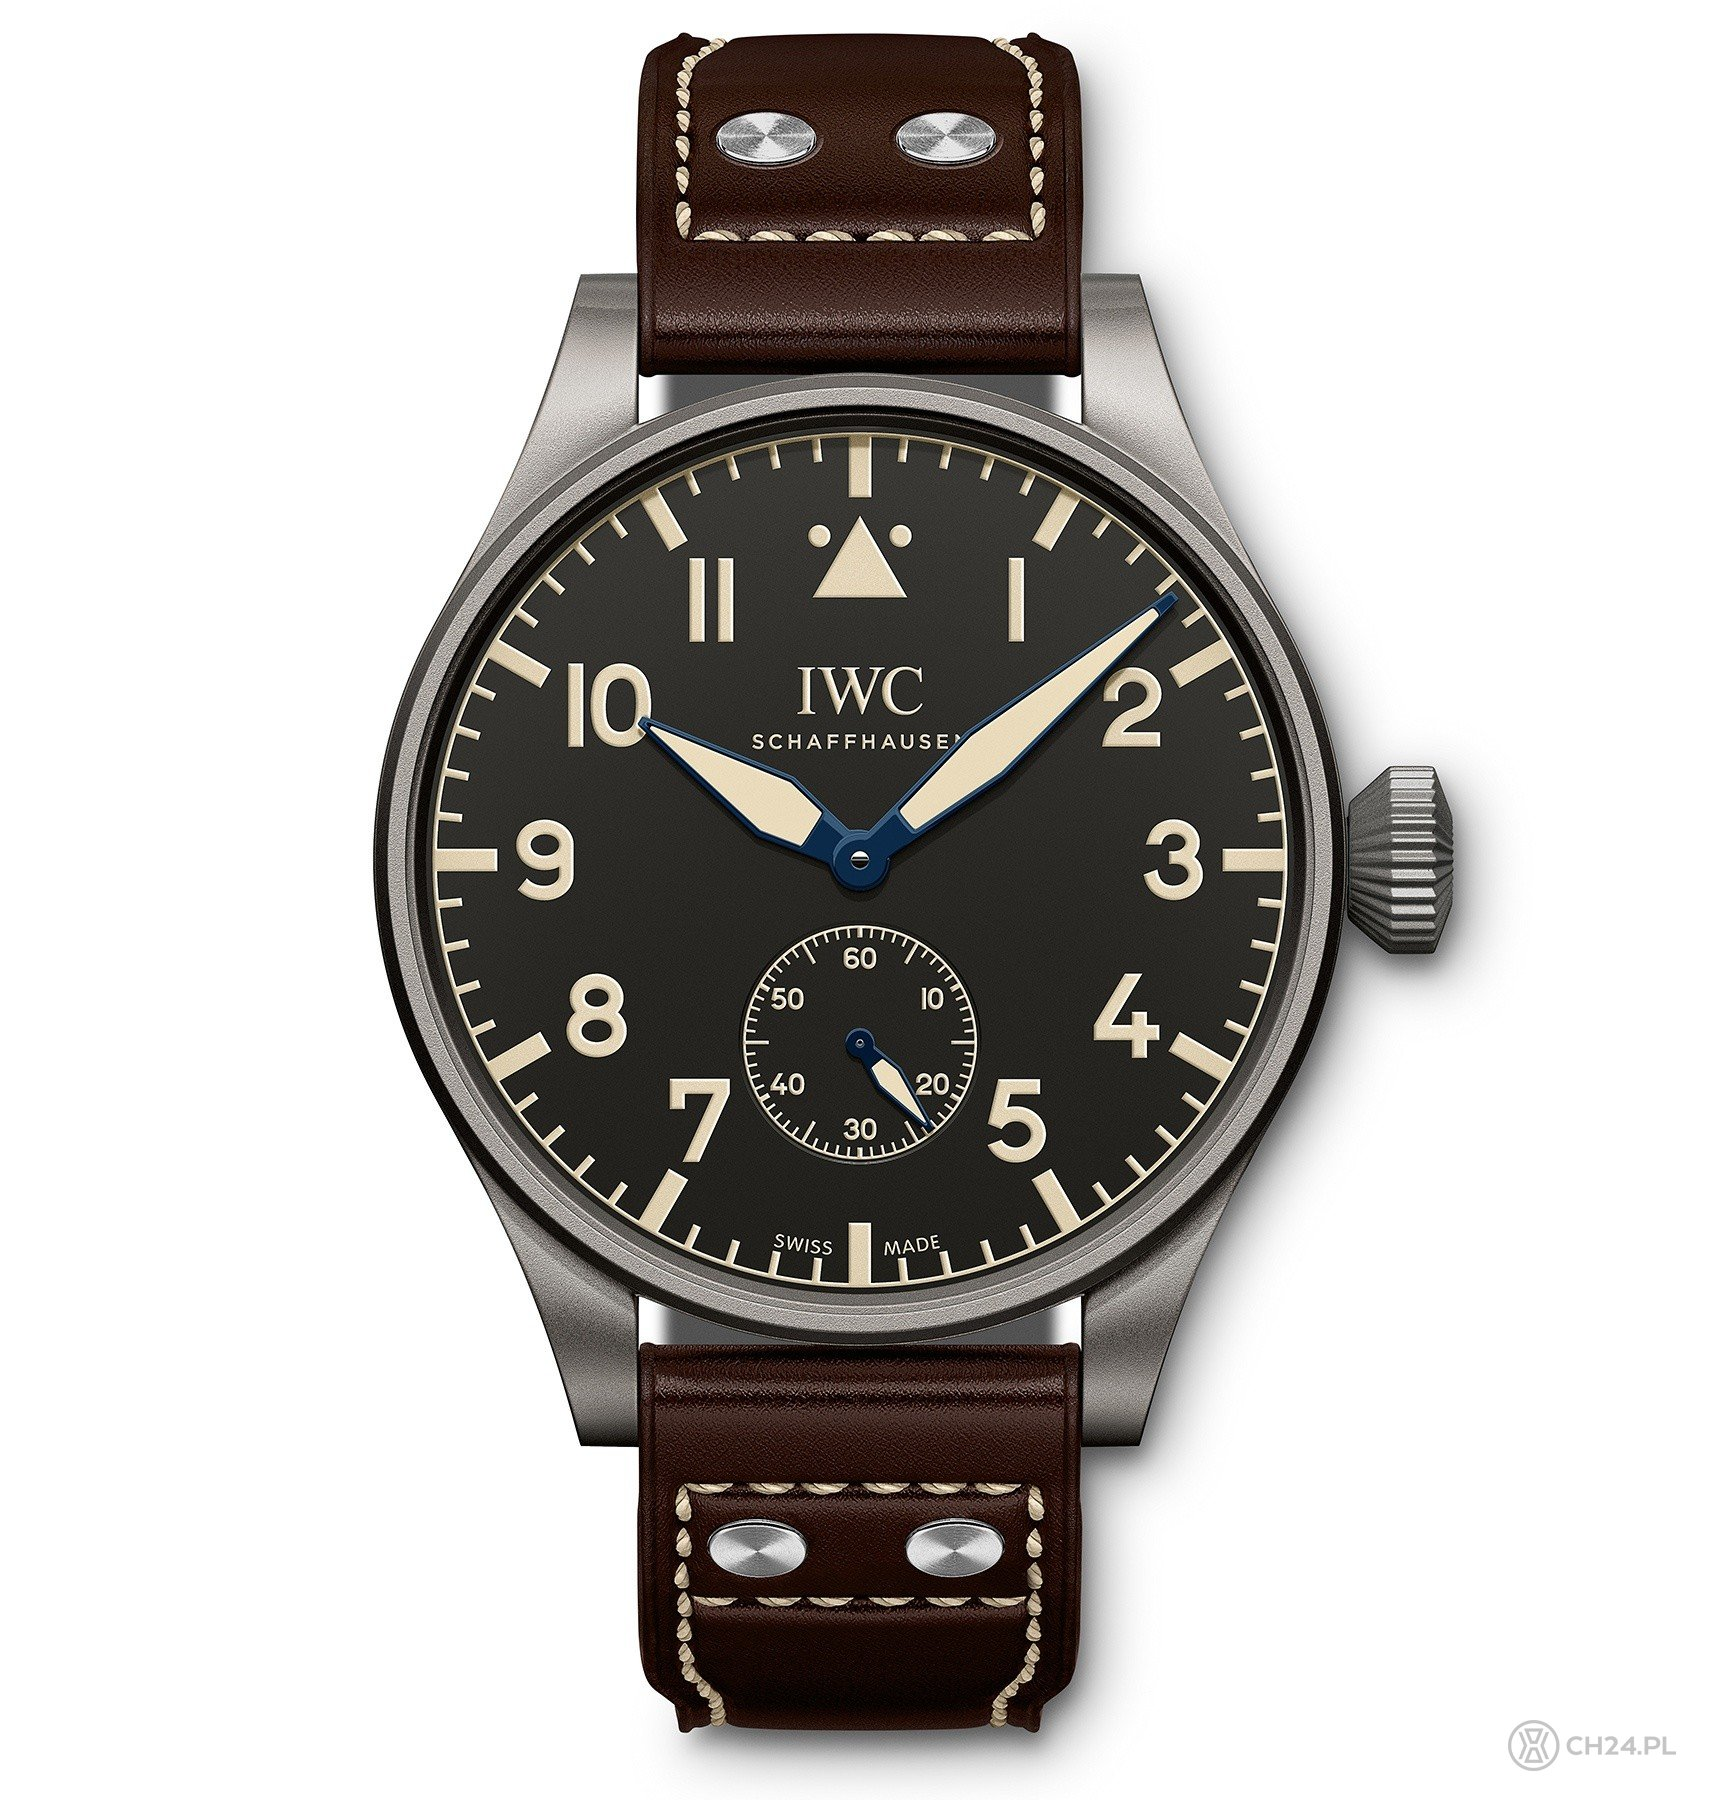 SIHH 2016: IWC Big Pilot's Heritage Watch